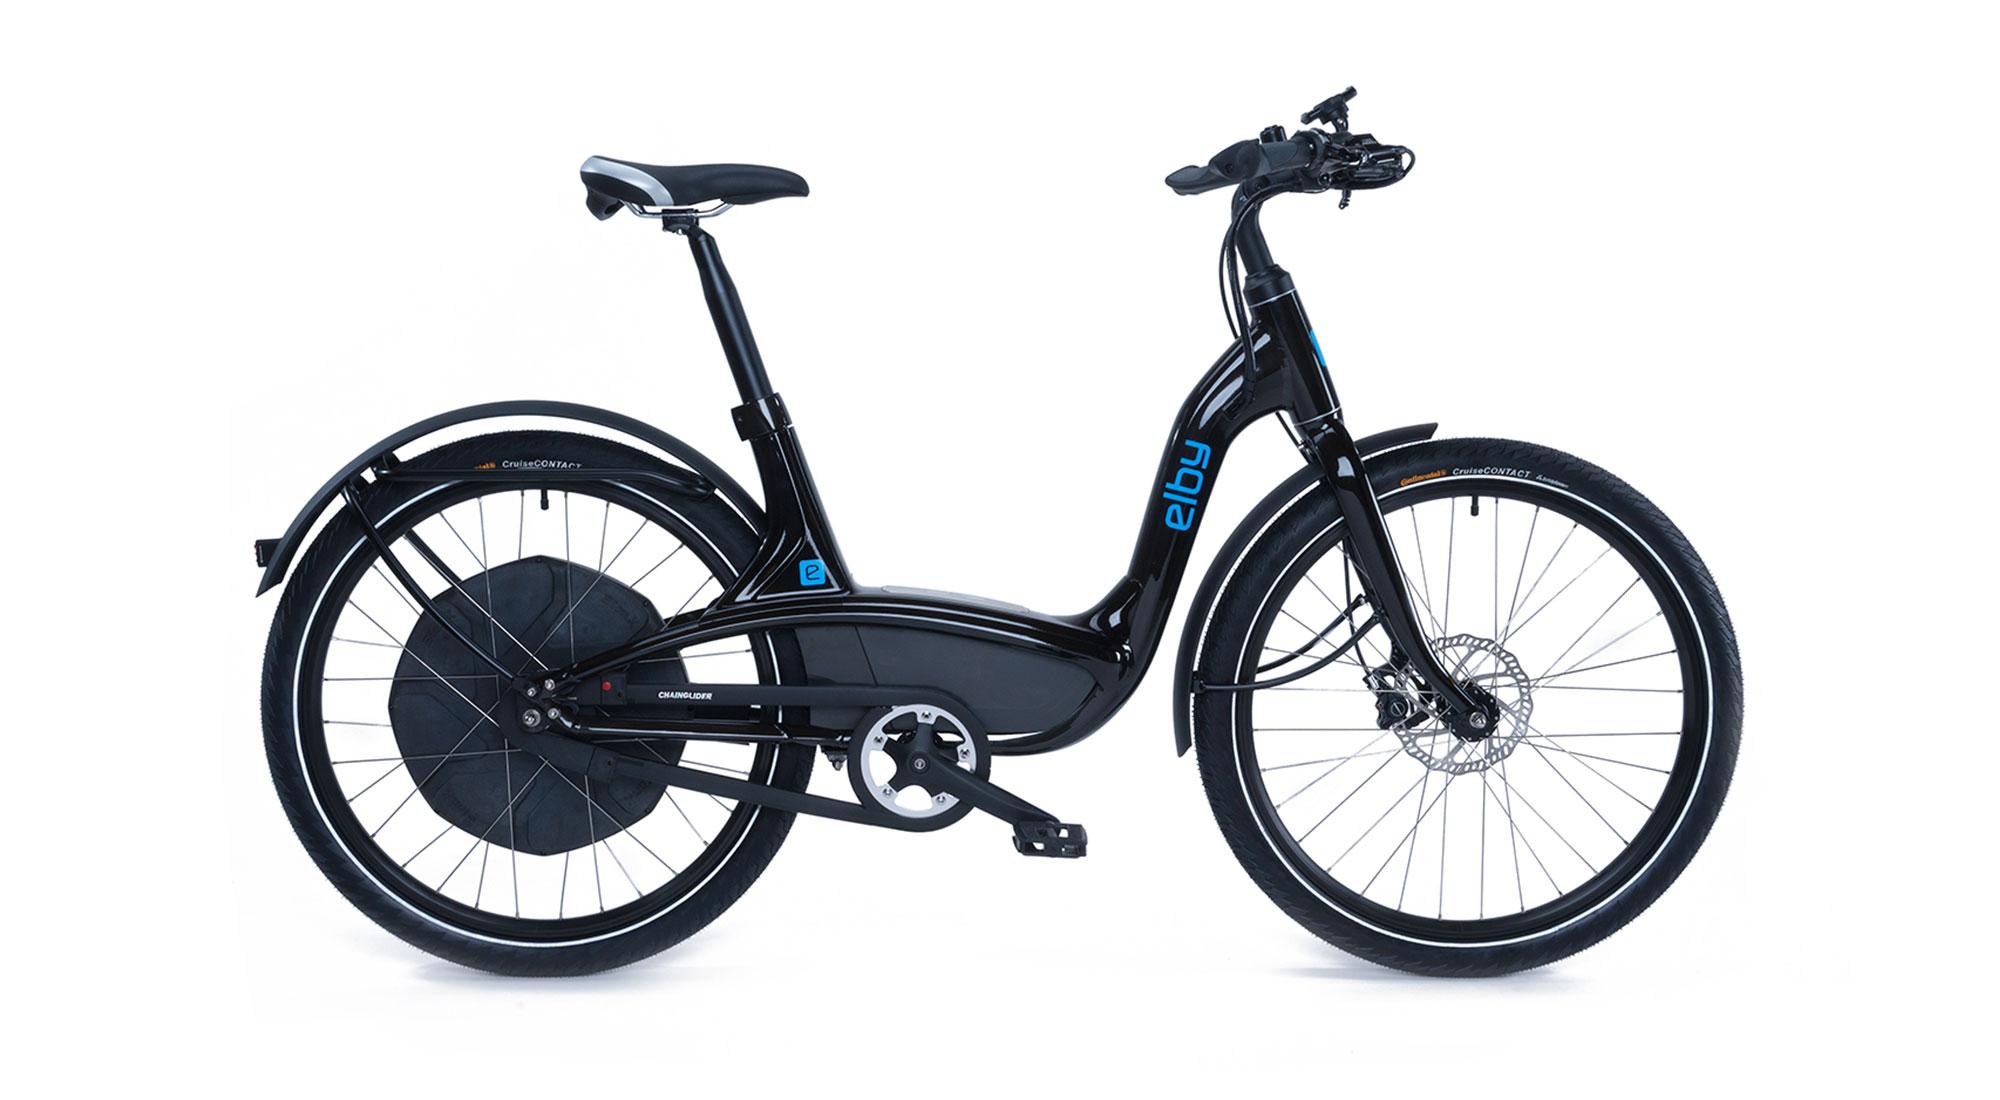 elby bike black one-speed